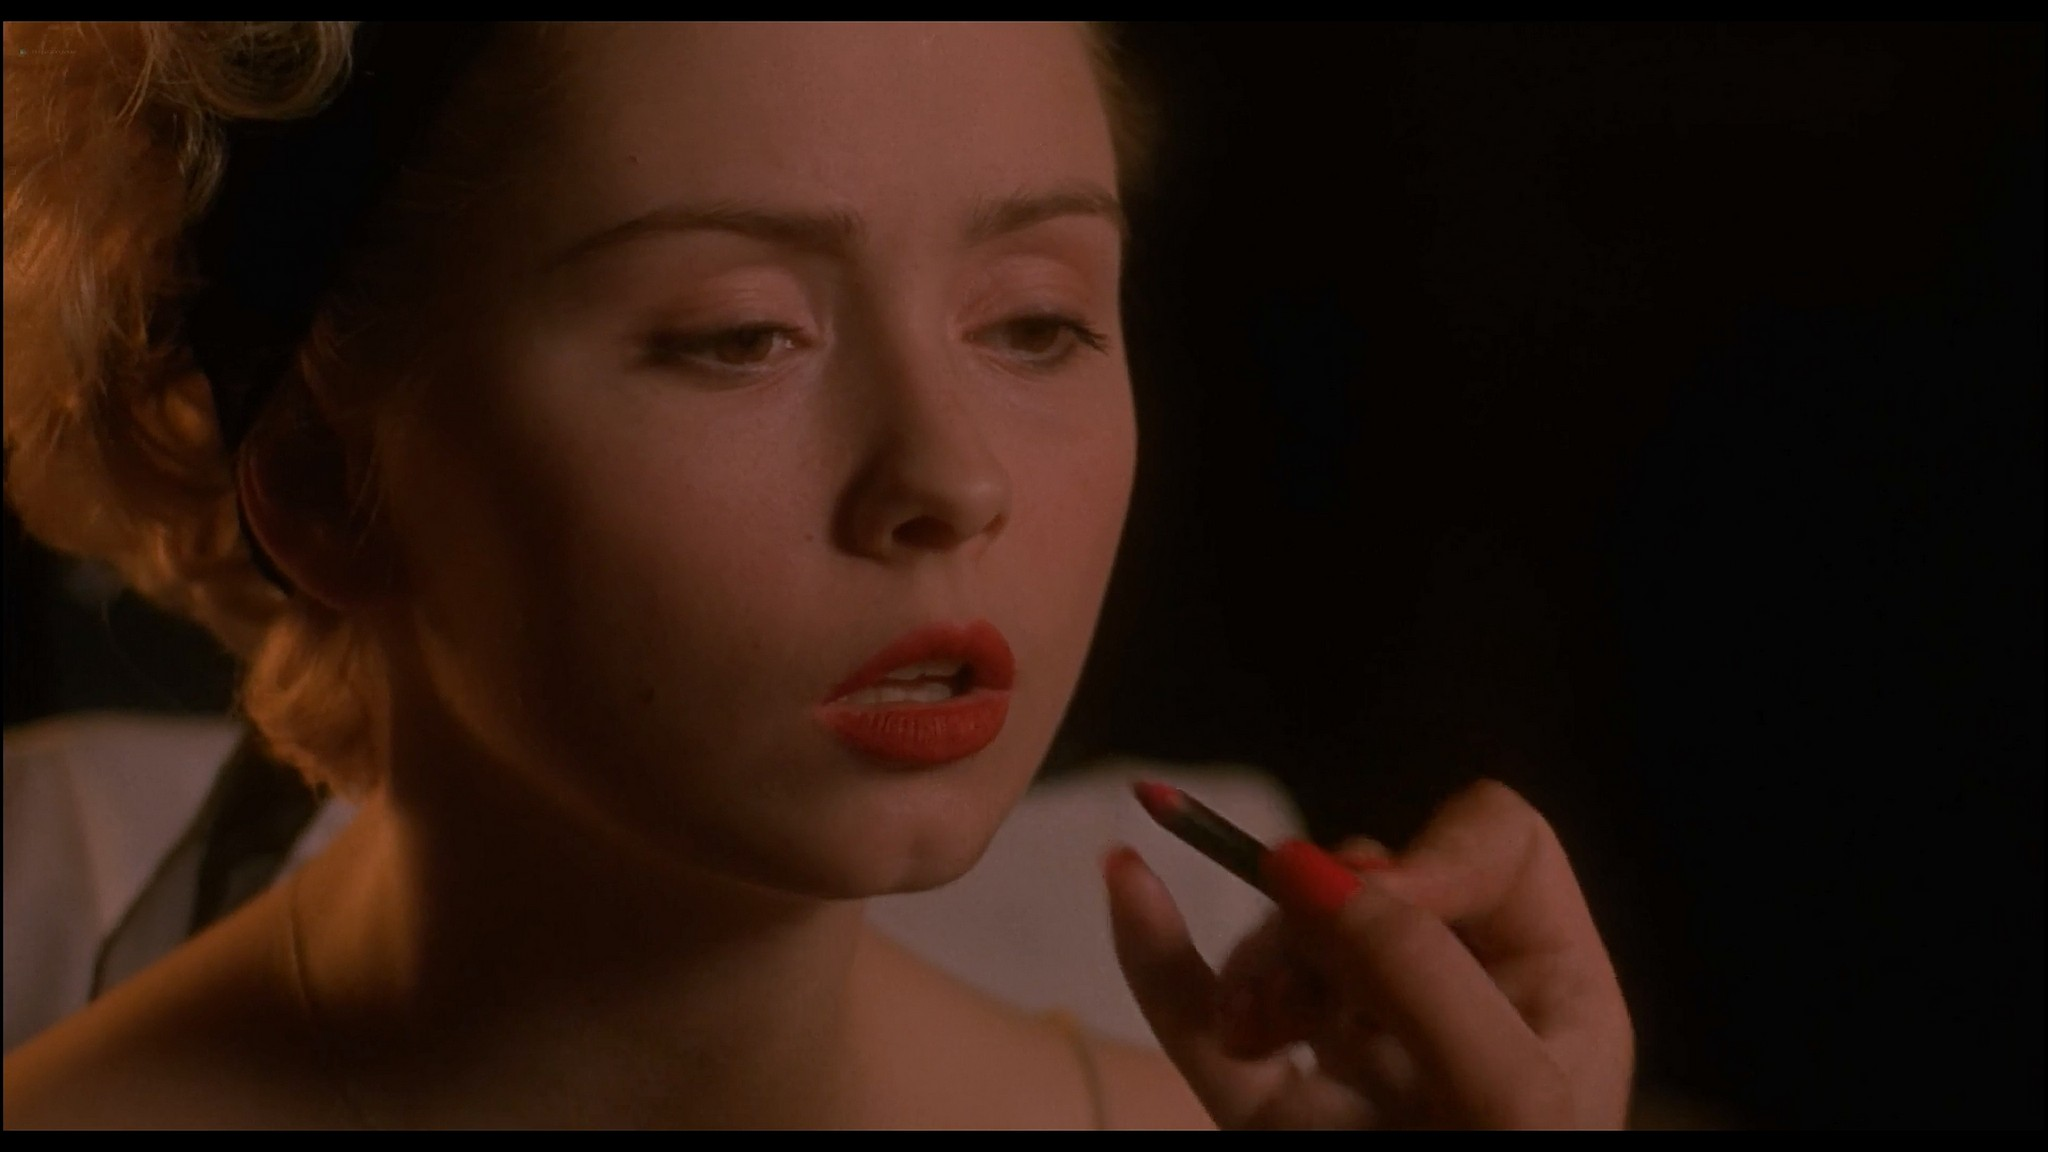 Nina Siemaszko nude sex Lydie Denier Gloria Reuben and others nude sex Wild Orchid 2 1992 1080p BluRay